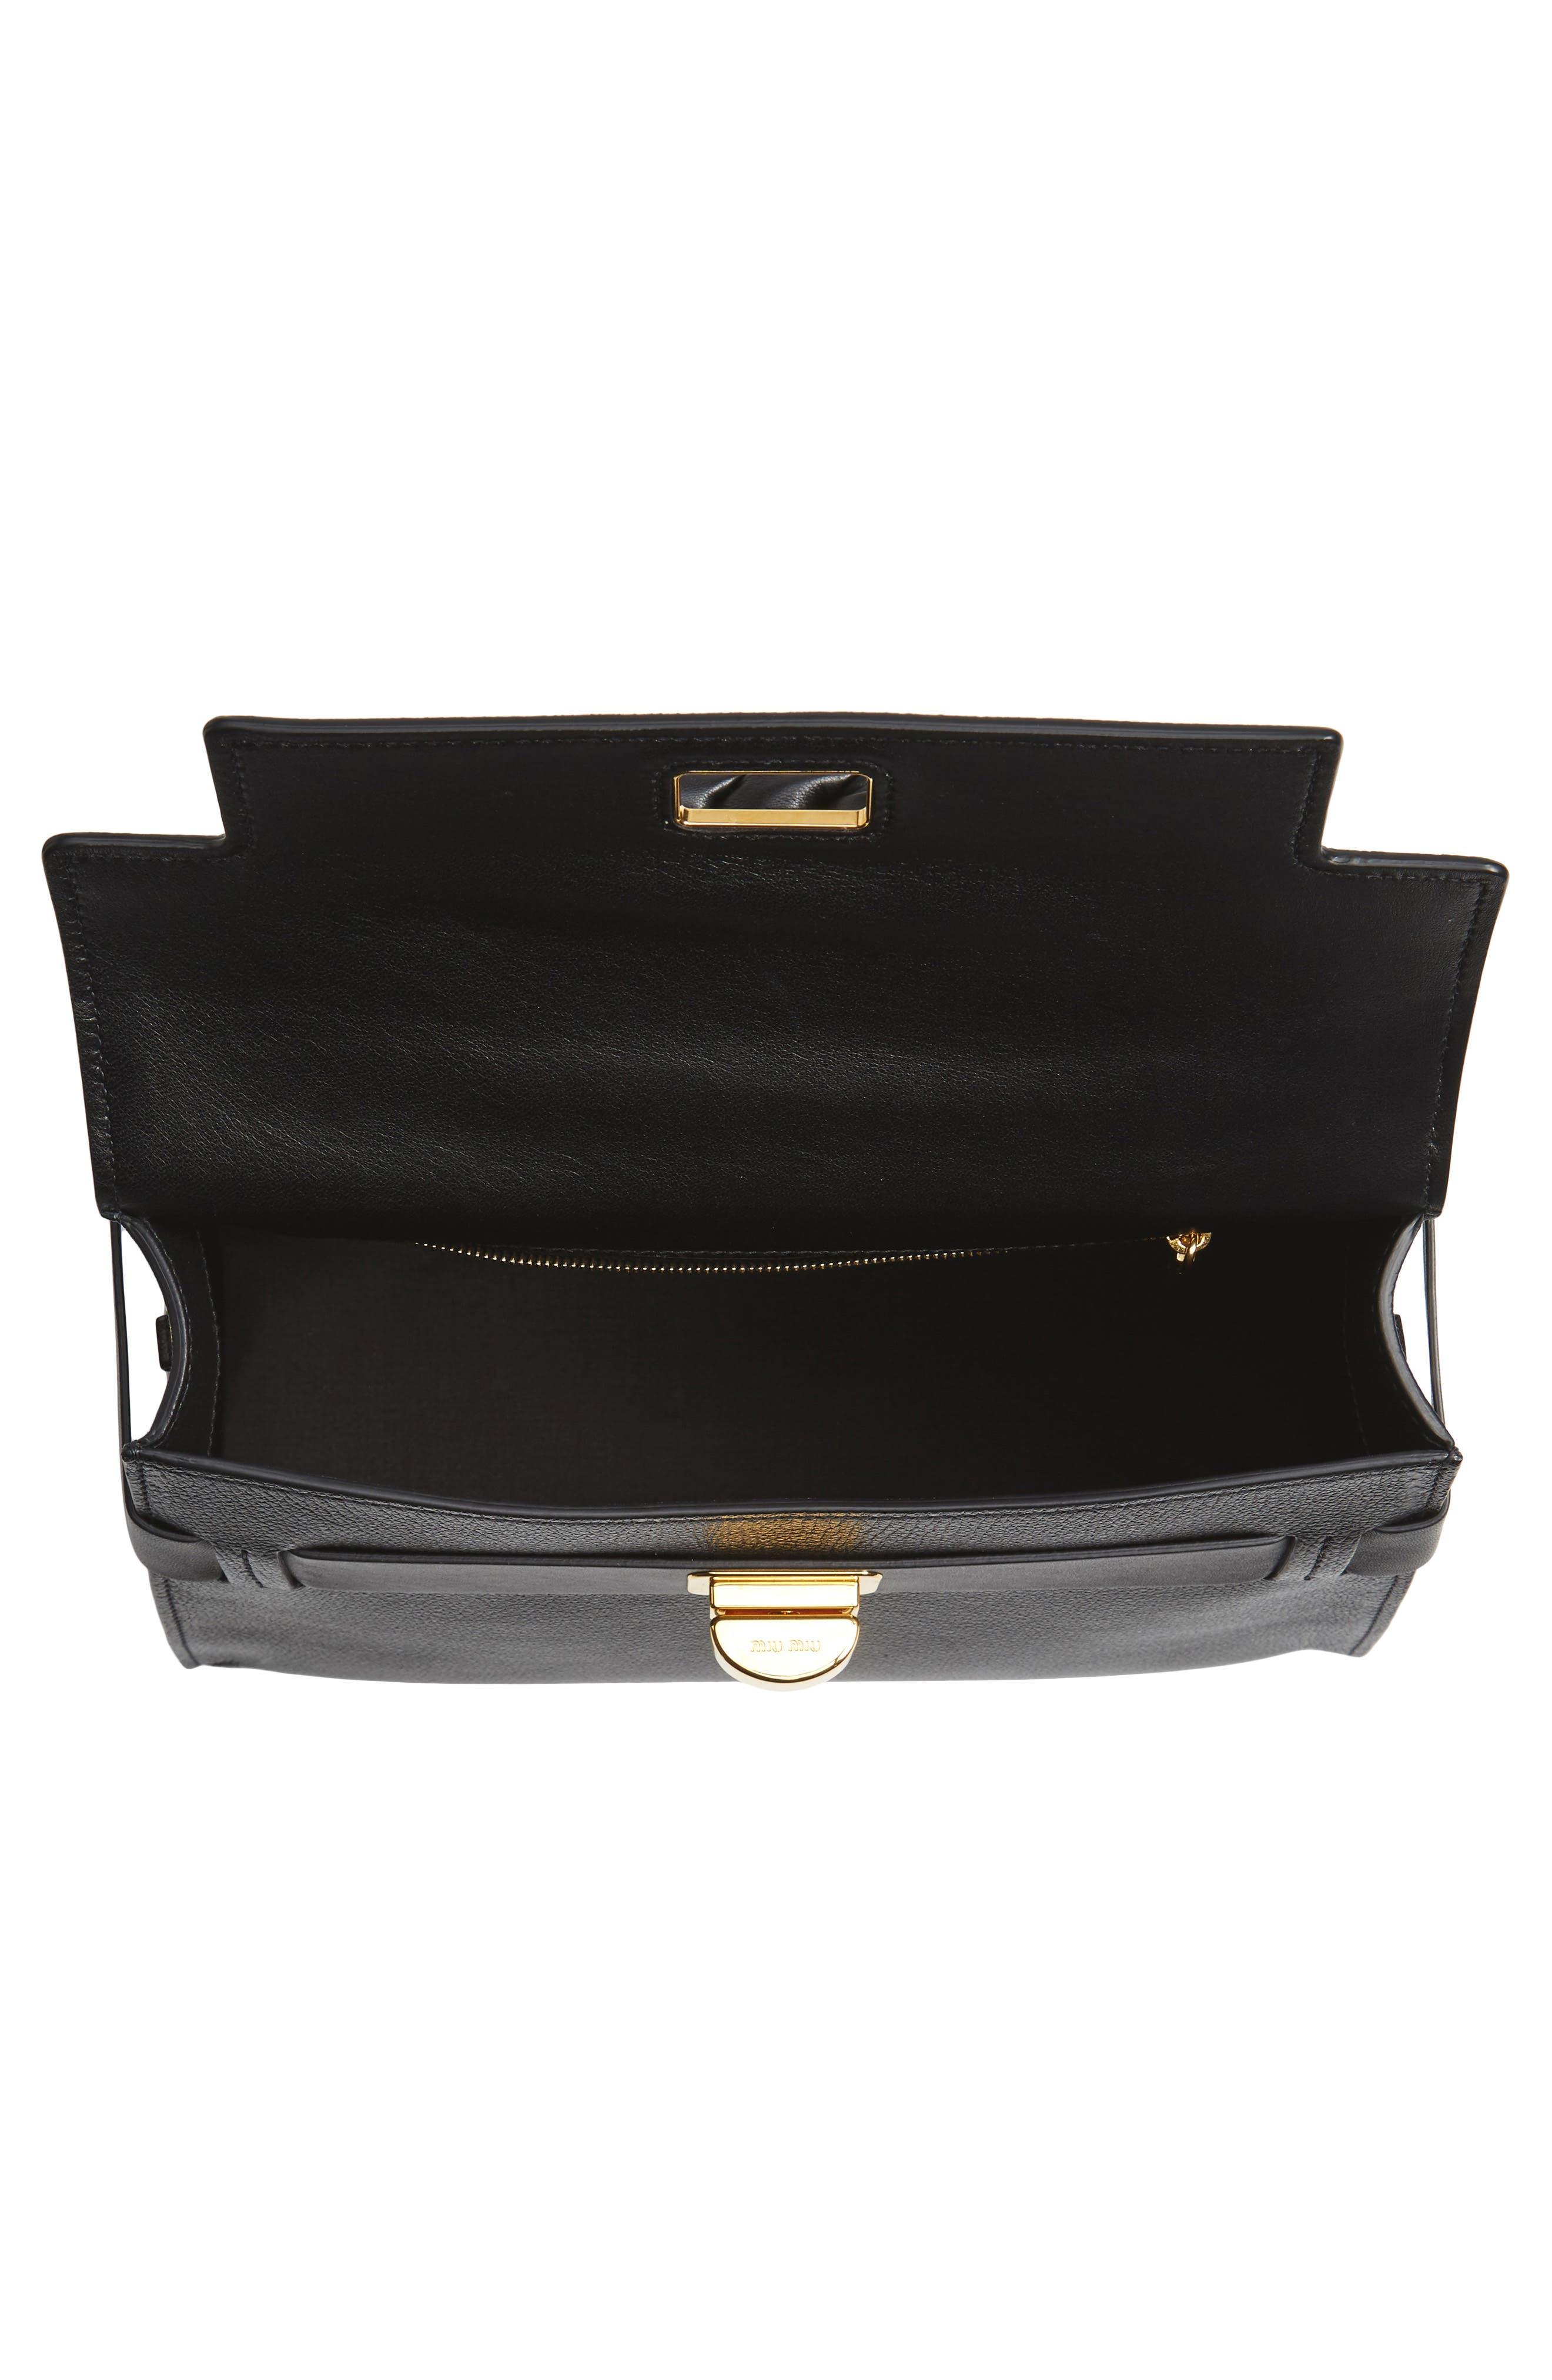 Madras Click Goatskin Leather Satchel,                             Alternate thumbnail 4, color,                             Black